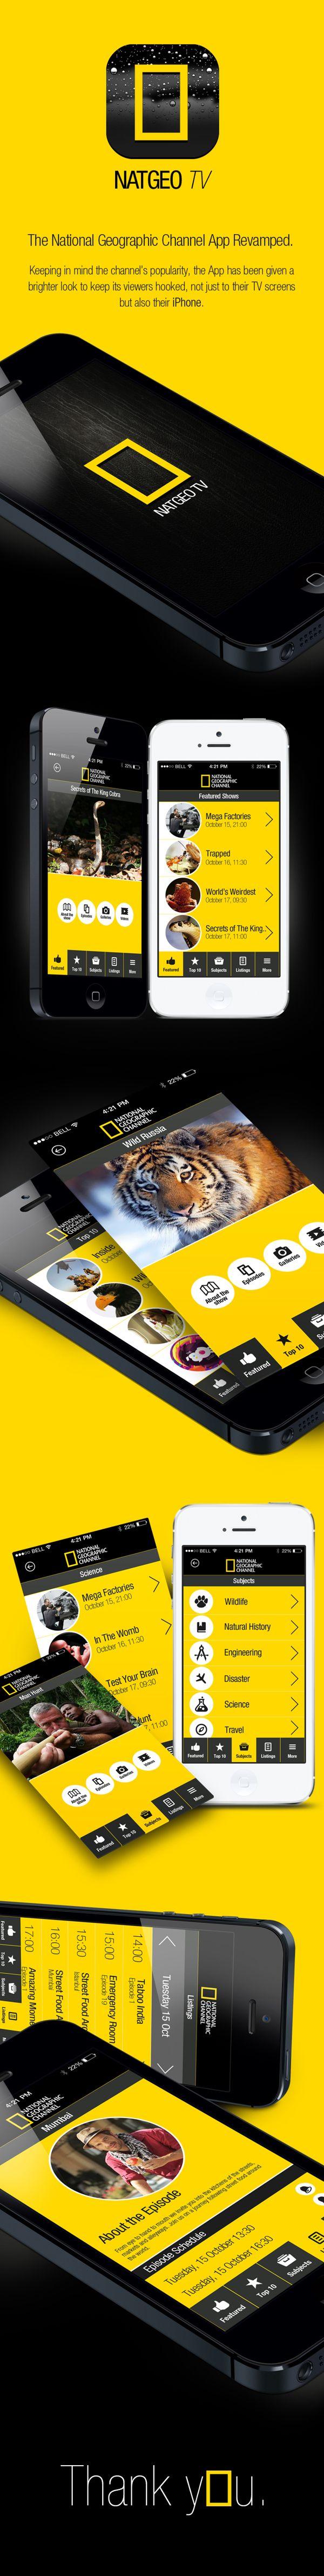 NATGEO TV App Revamped